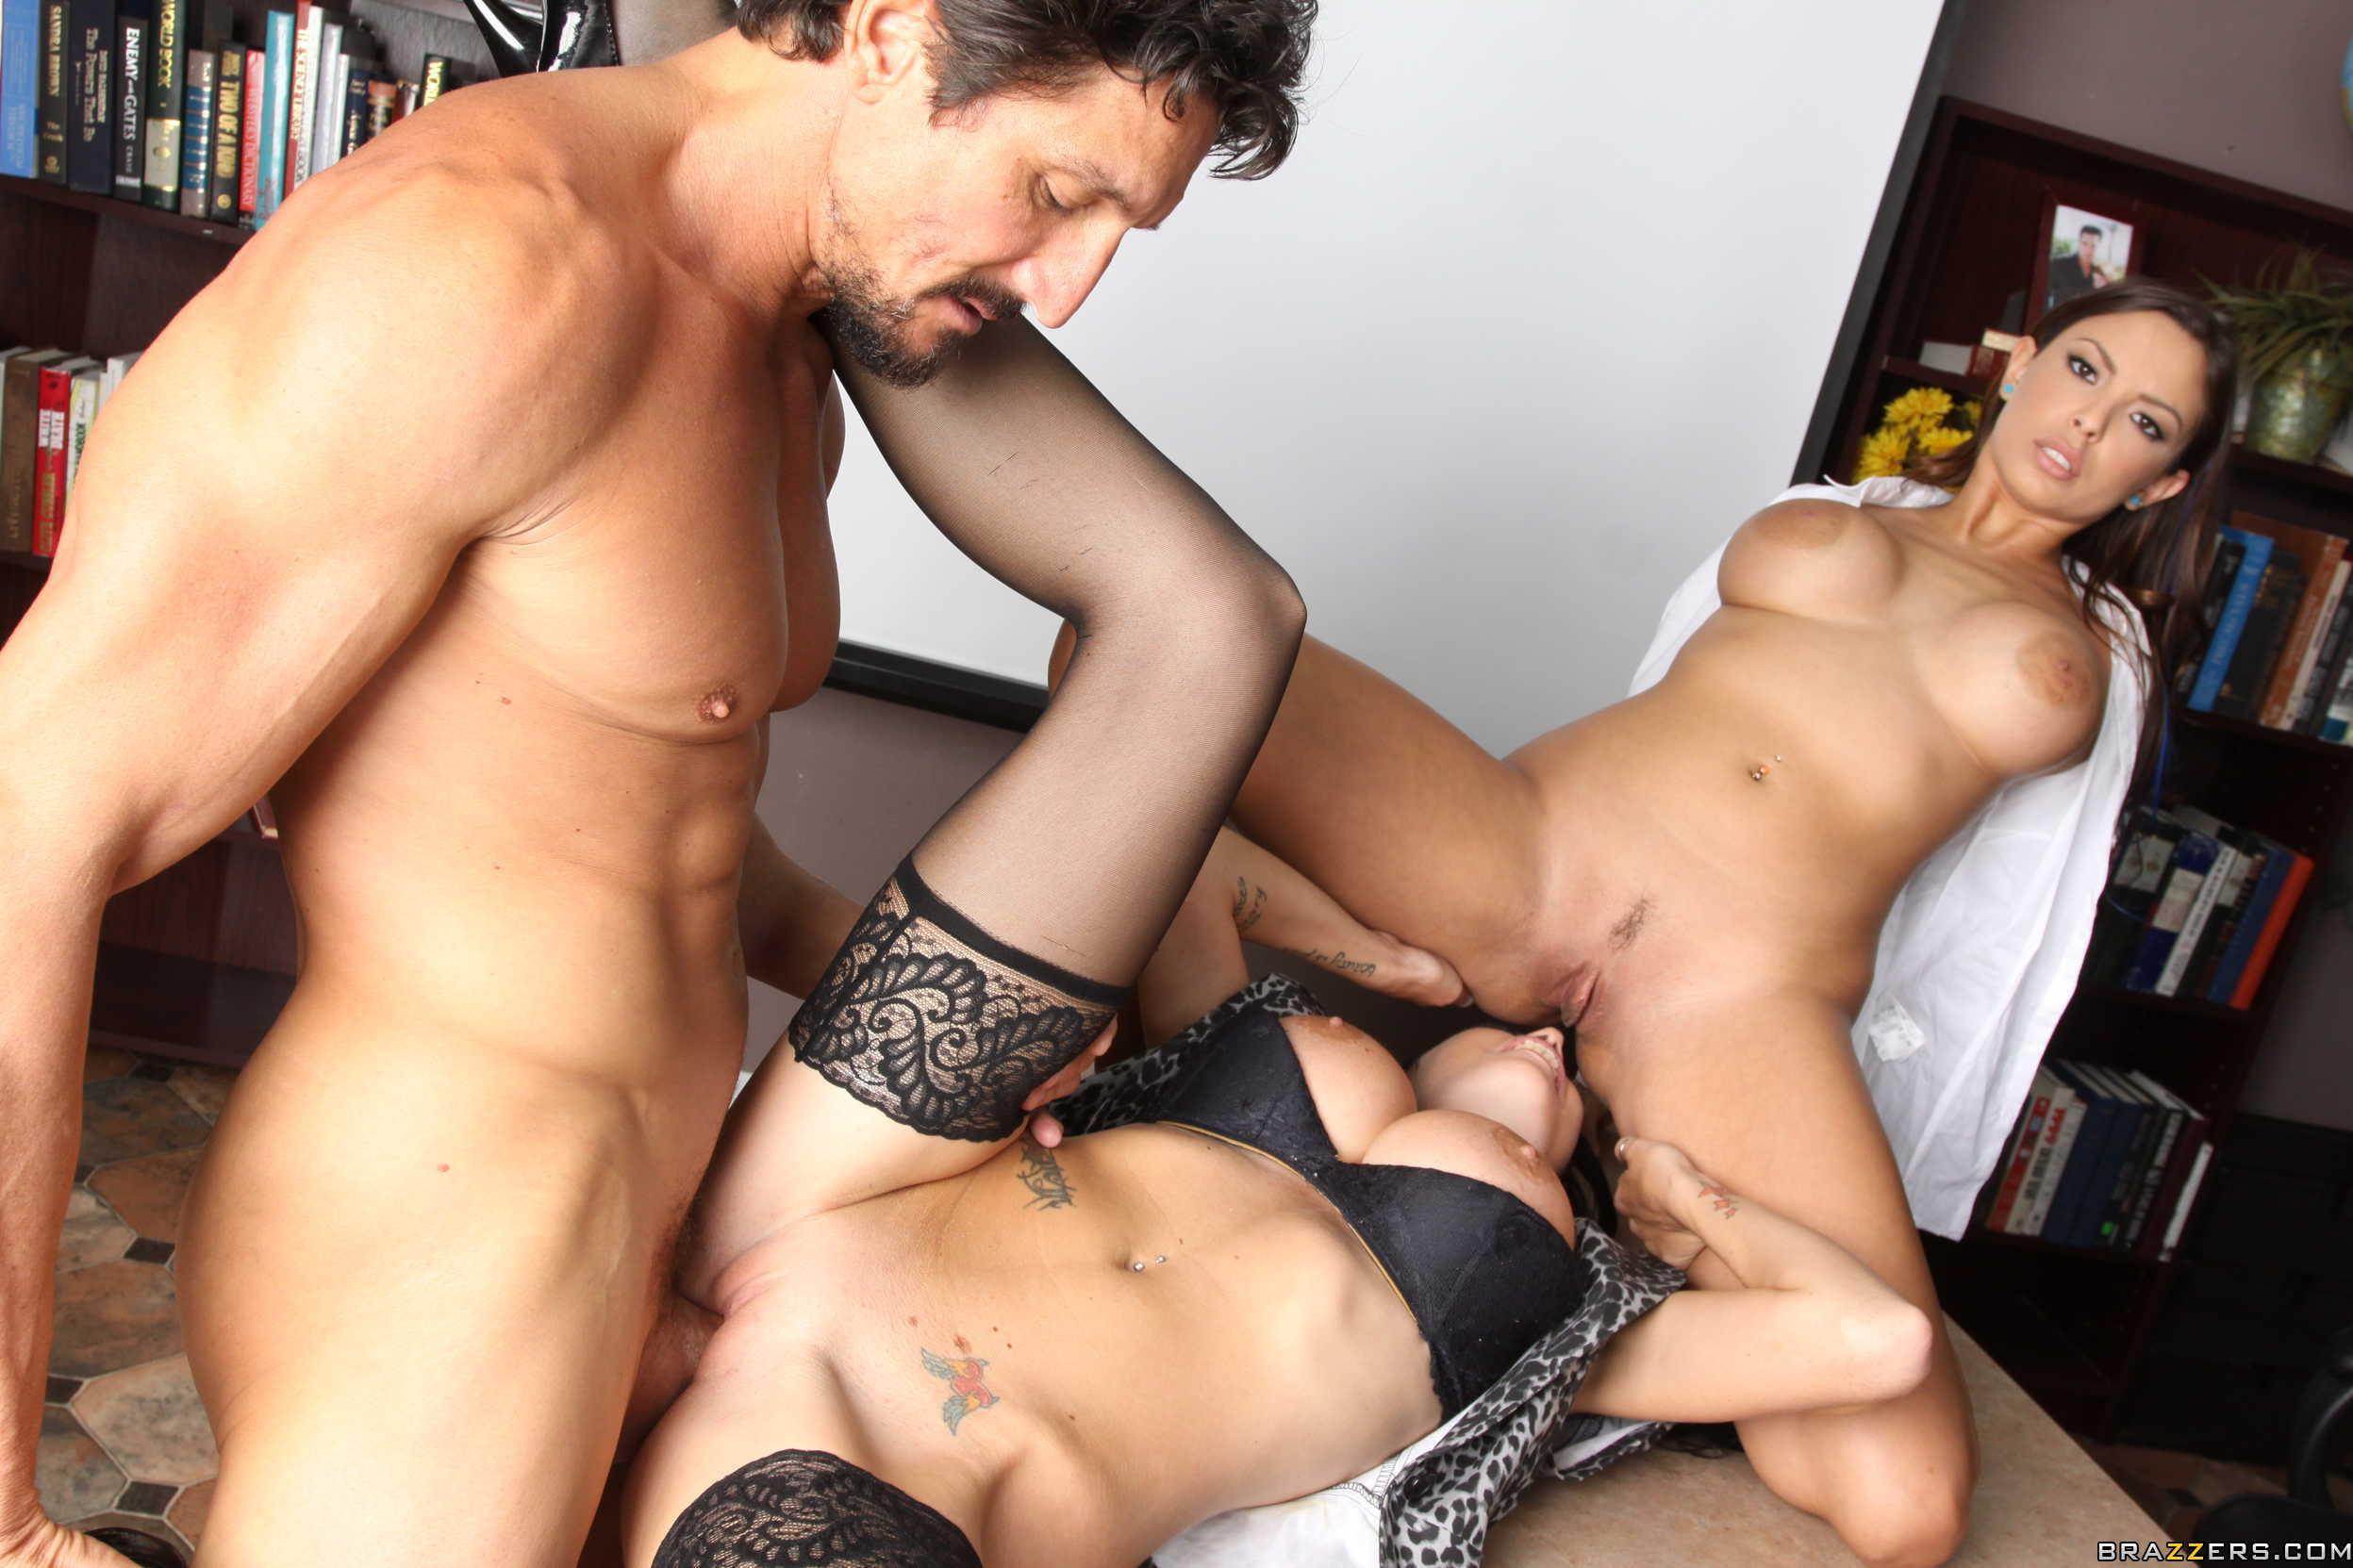 Emmanuelle London sex image #10148